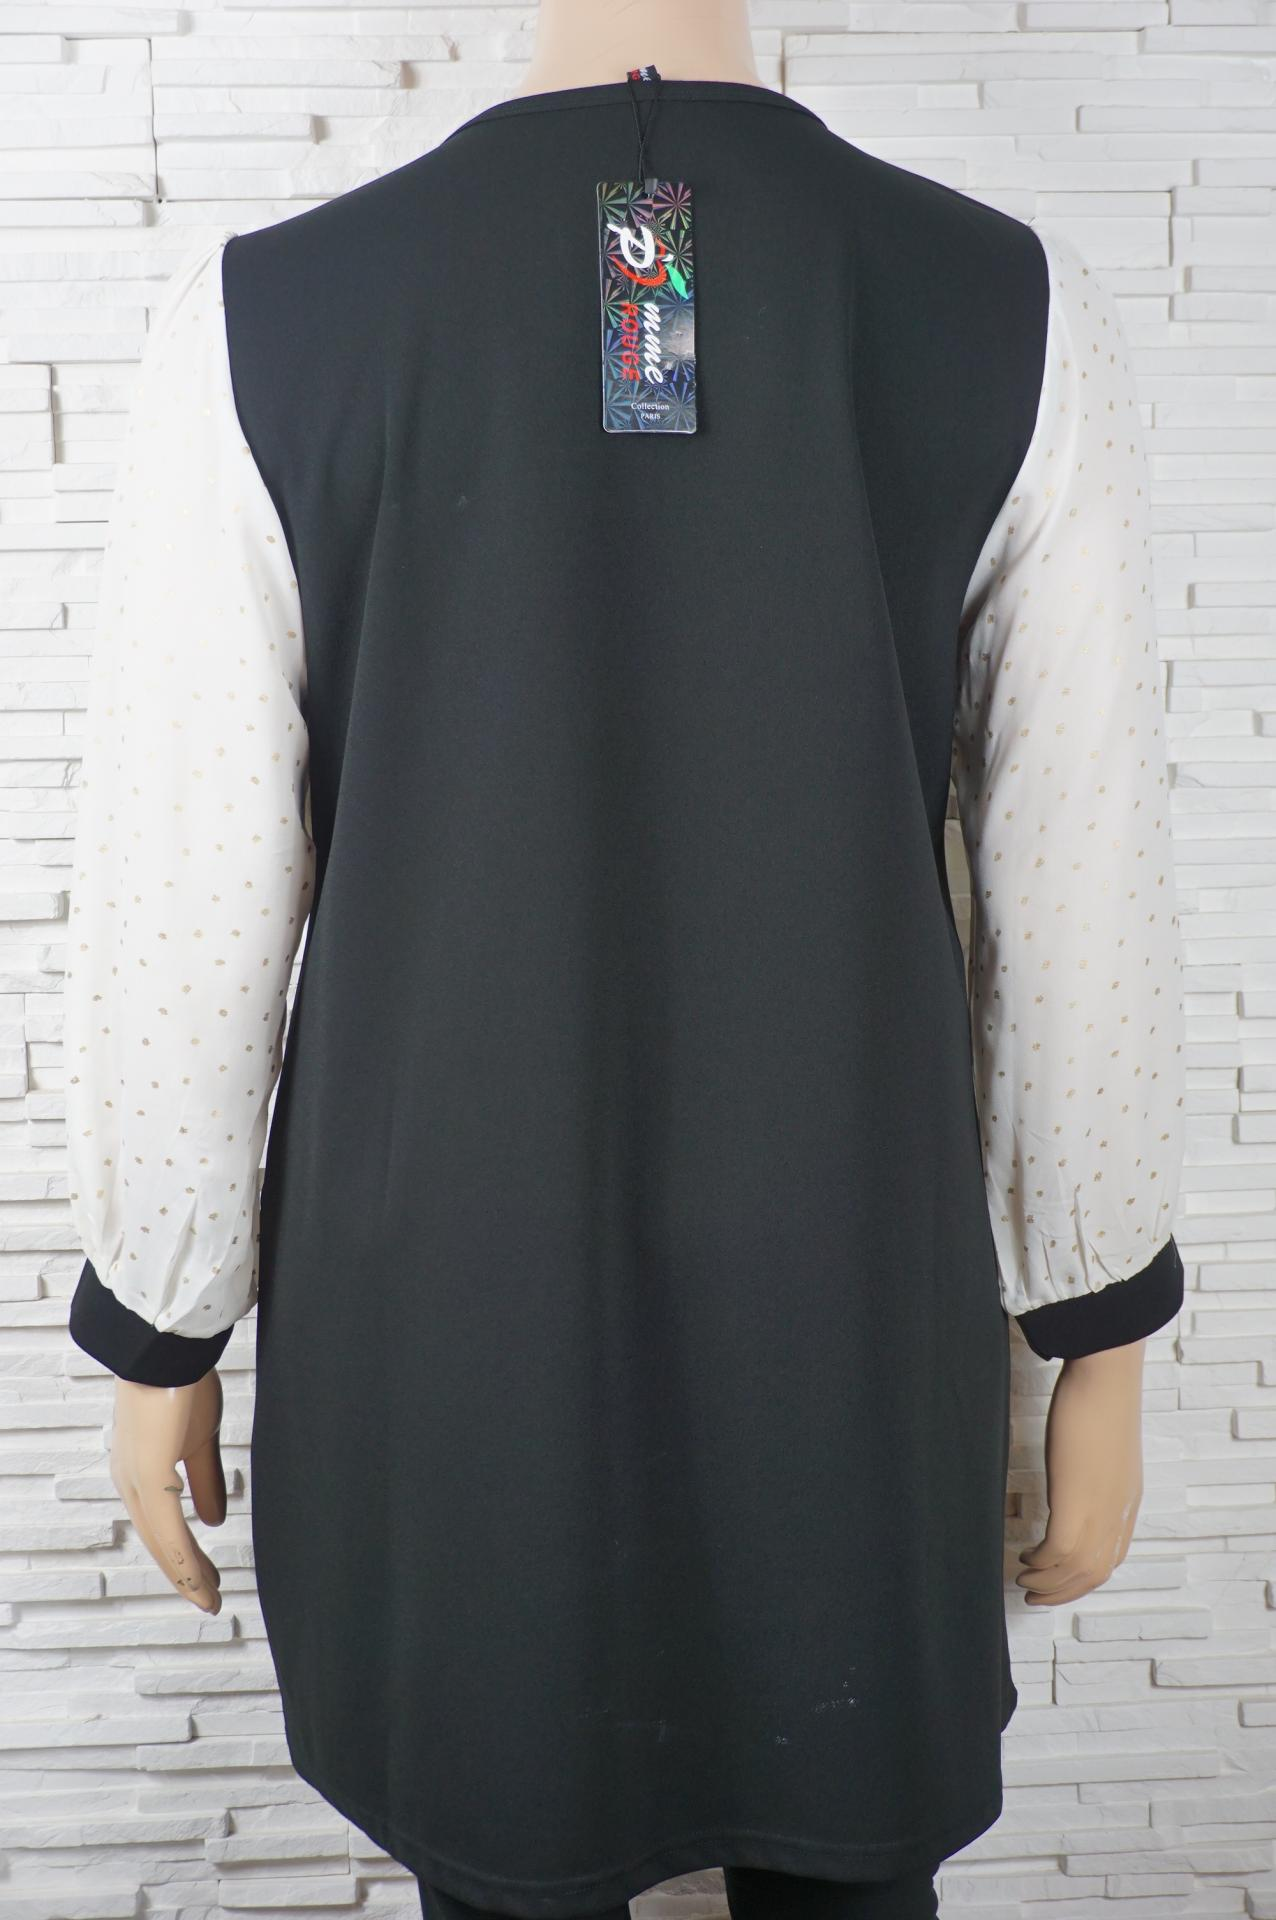 Robe vintage noir et blanc1